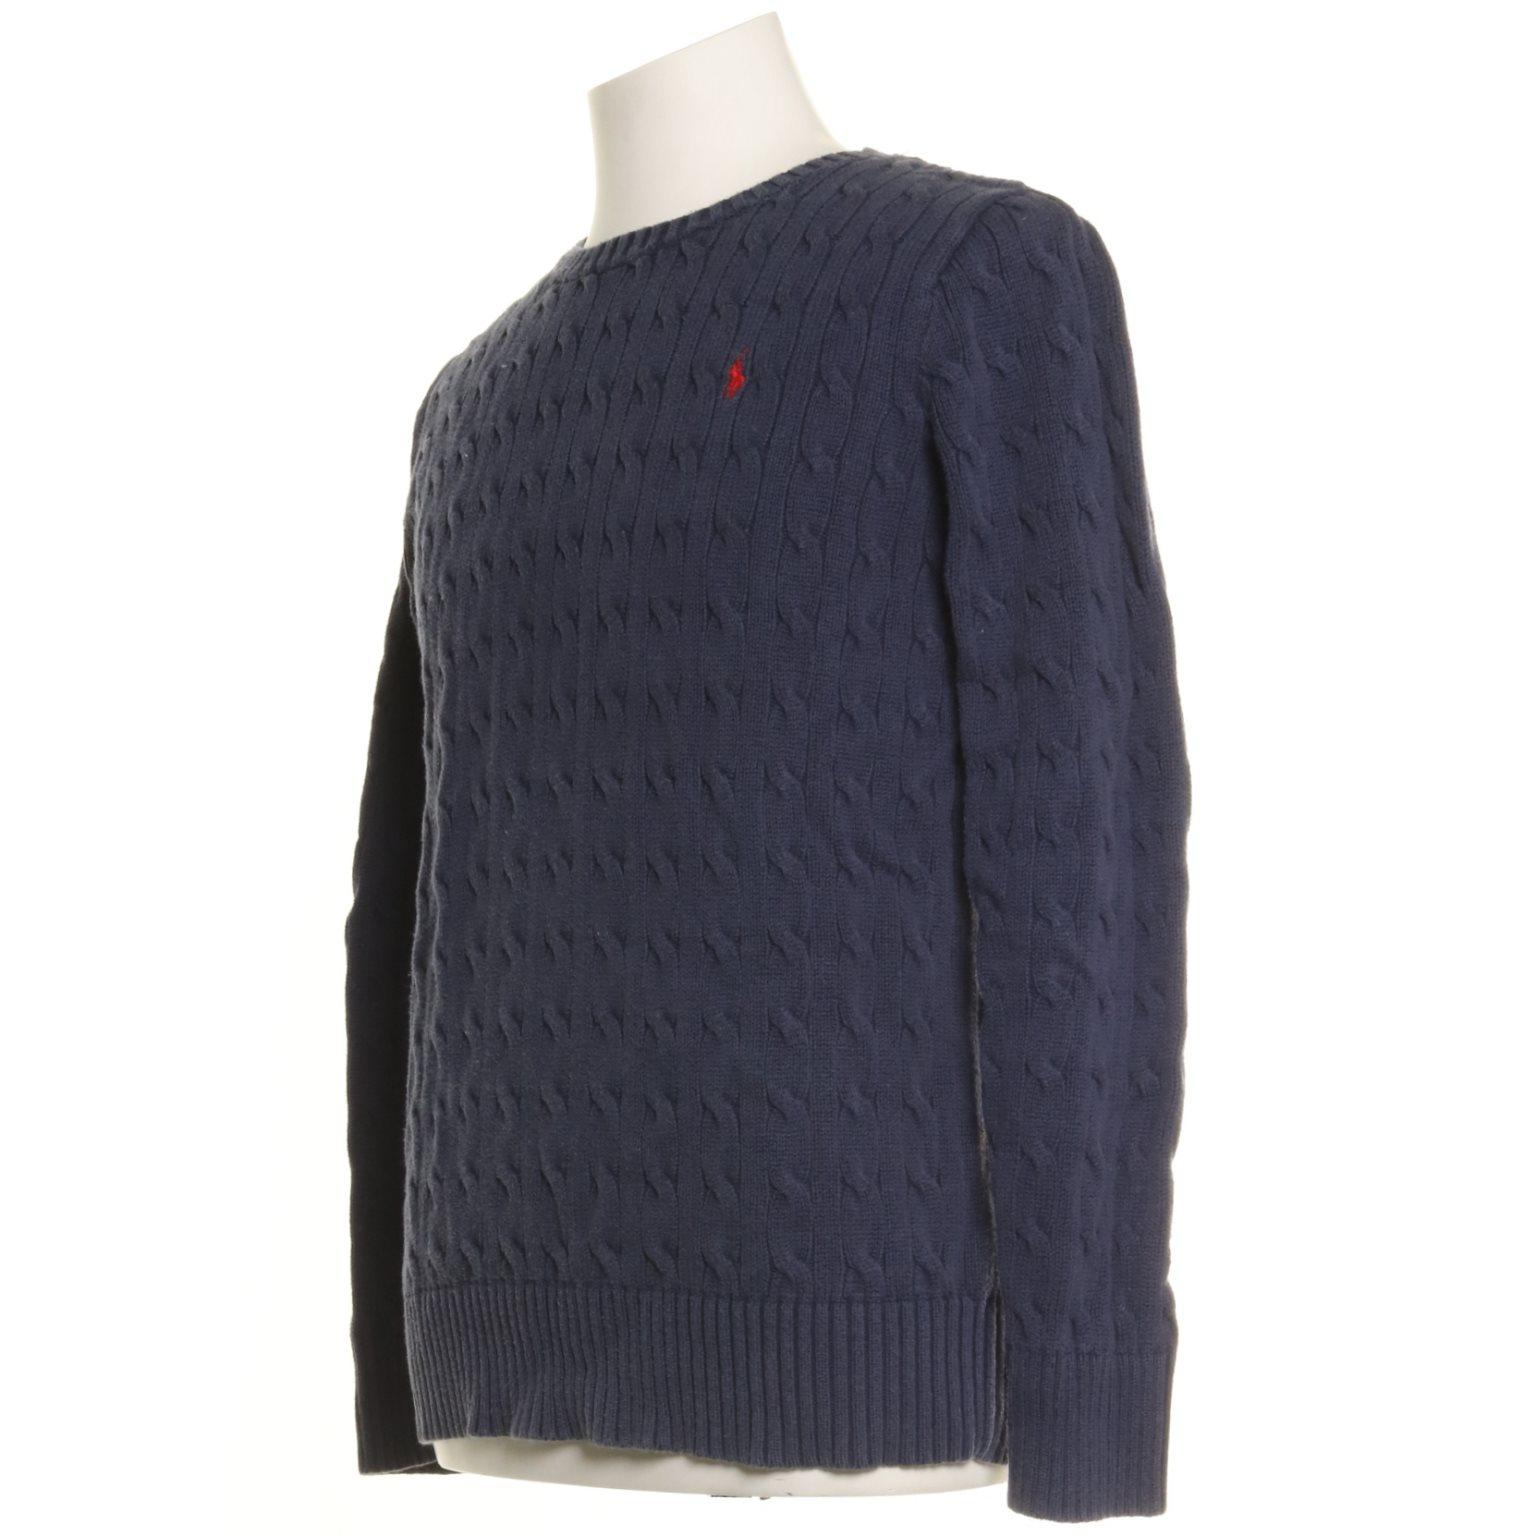 Polo Ralph Lauren, Lauren, Lauren, Tröja, Strl: XL, Mörkblå 80493c